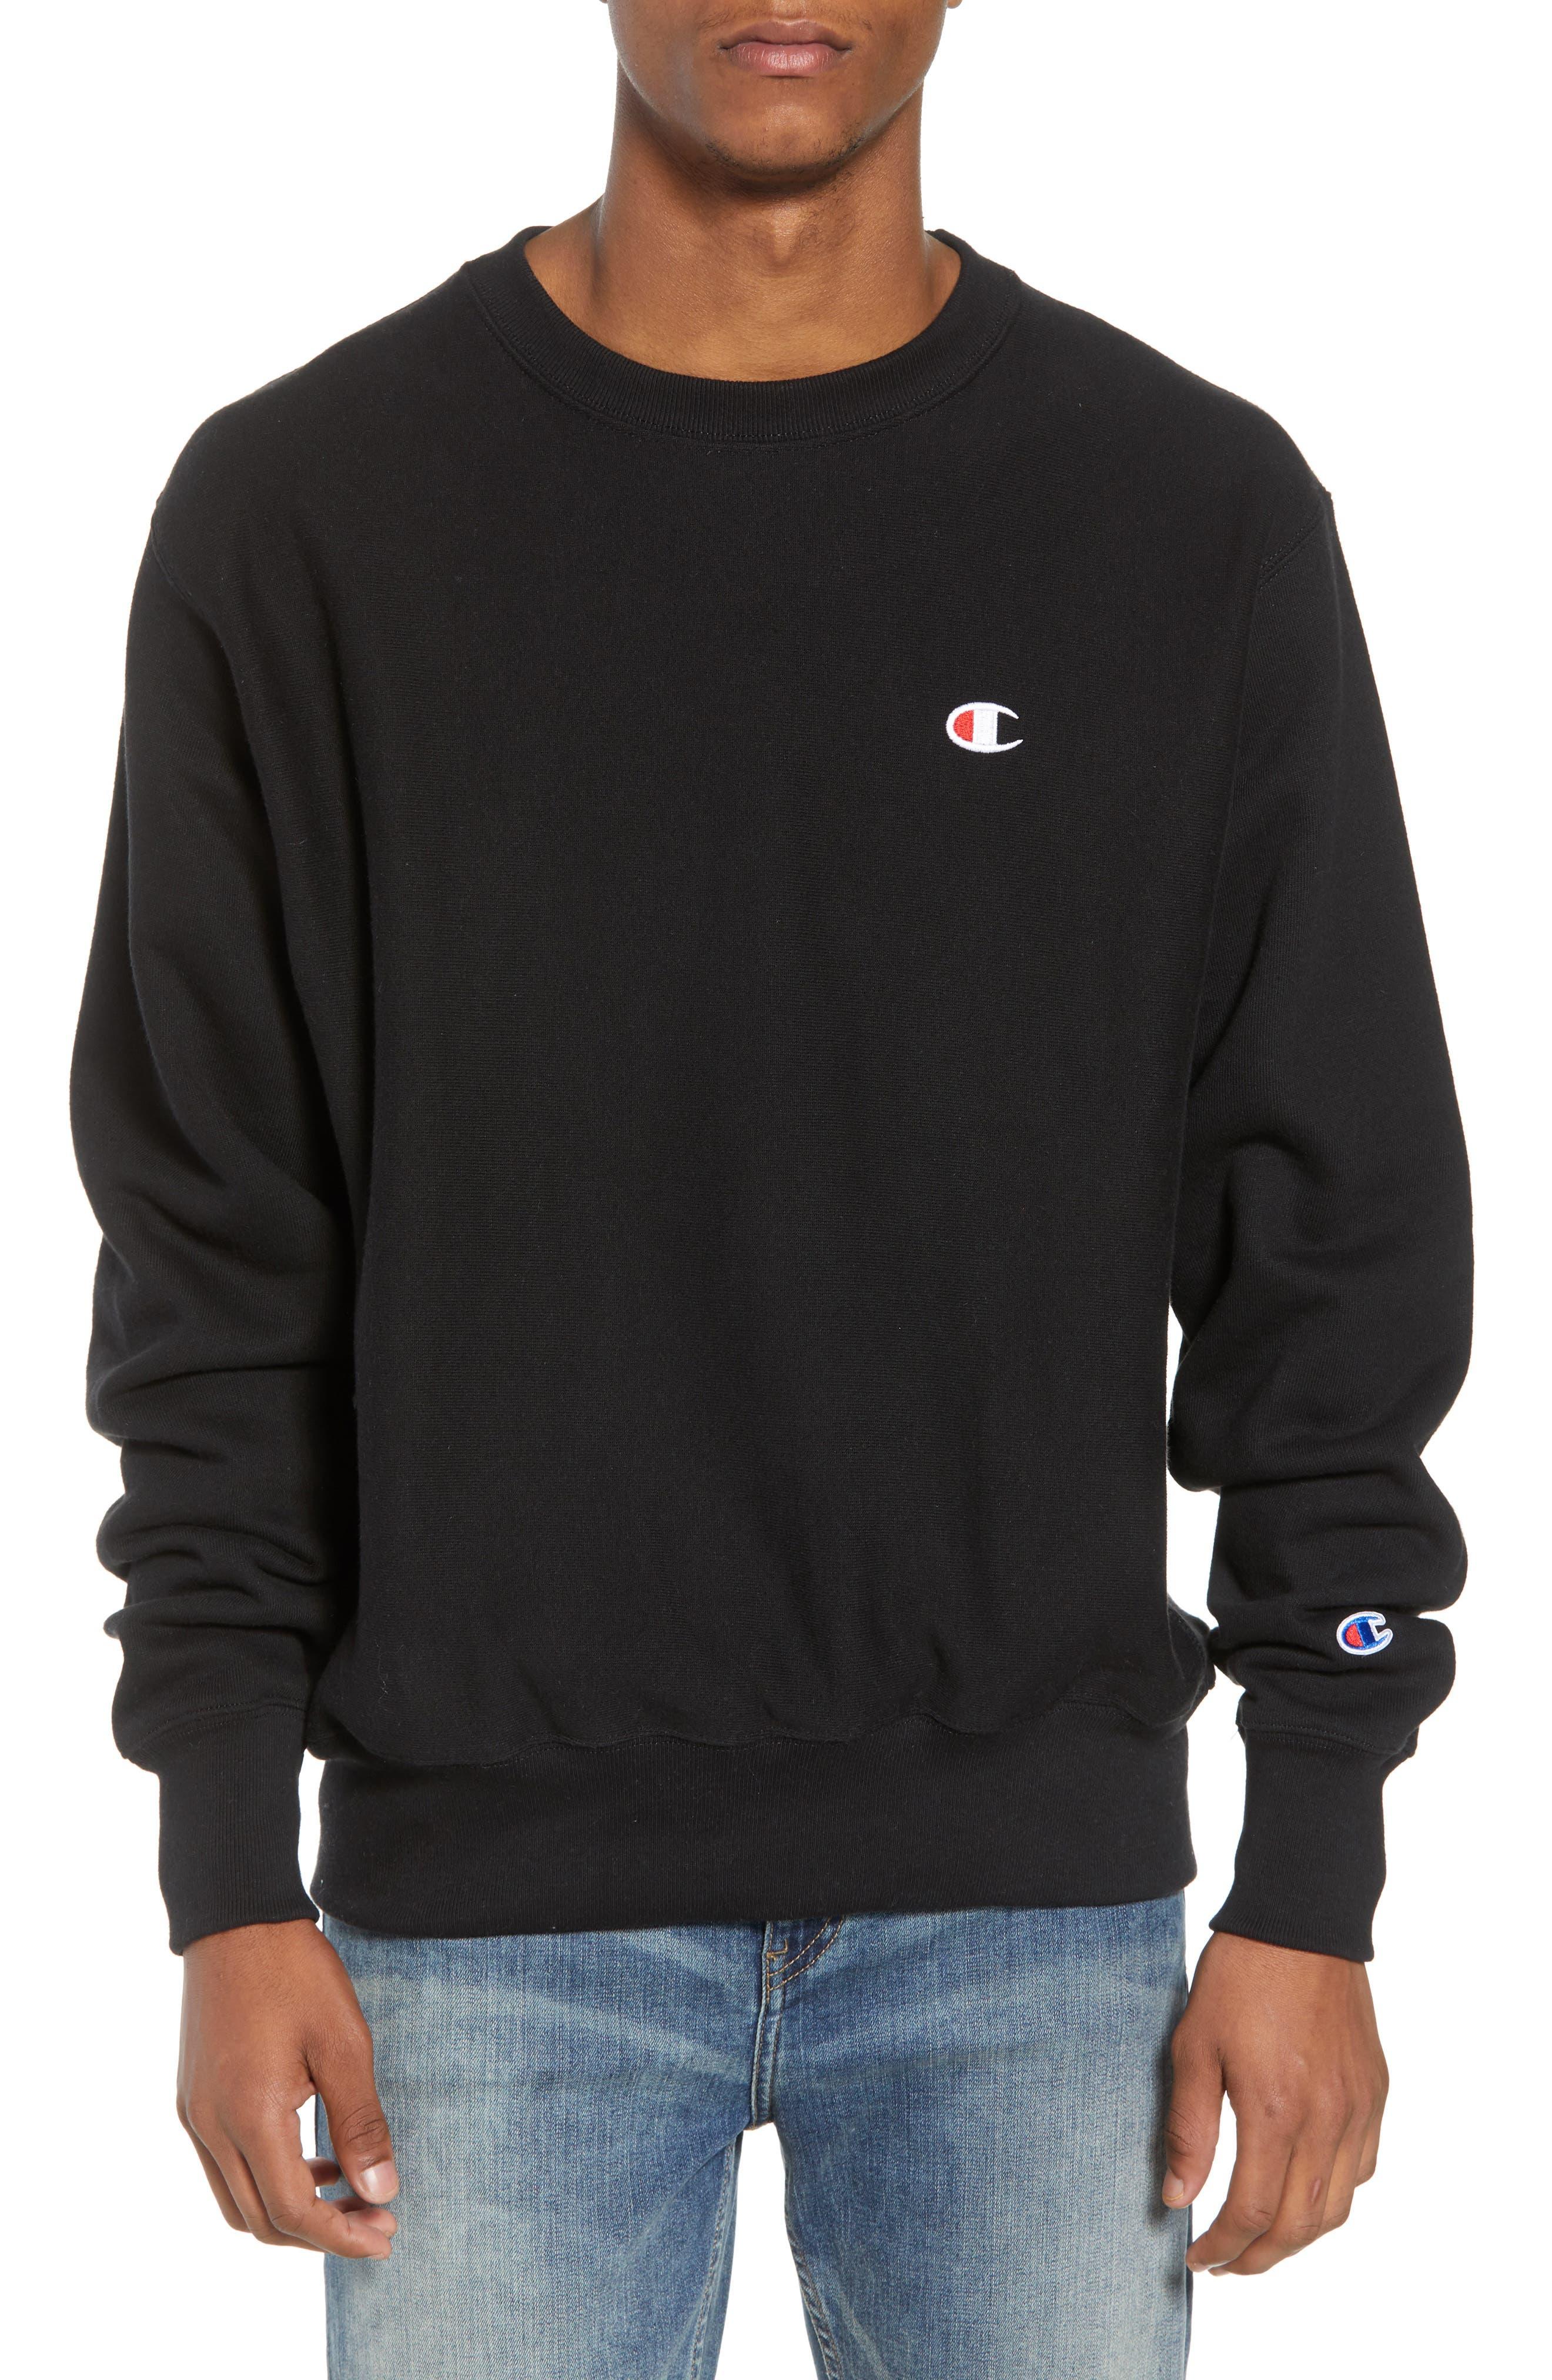 Reverse Weave Sweatshirt,                             Main thumbnail 1, color,                             Black